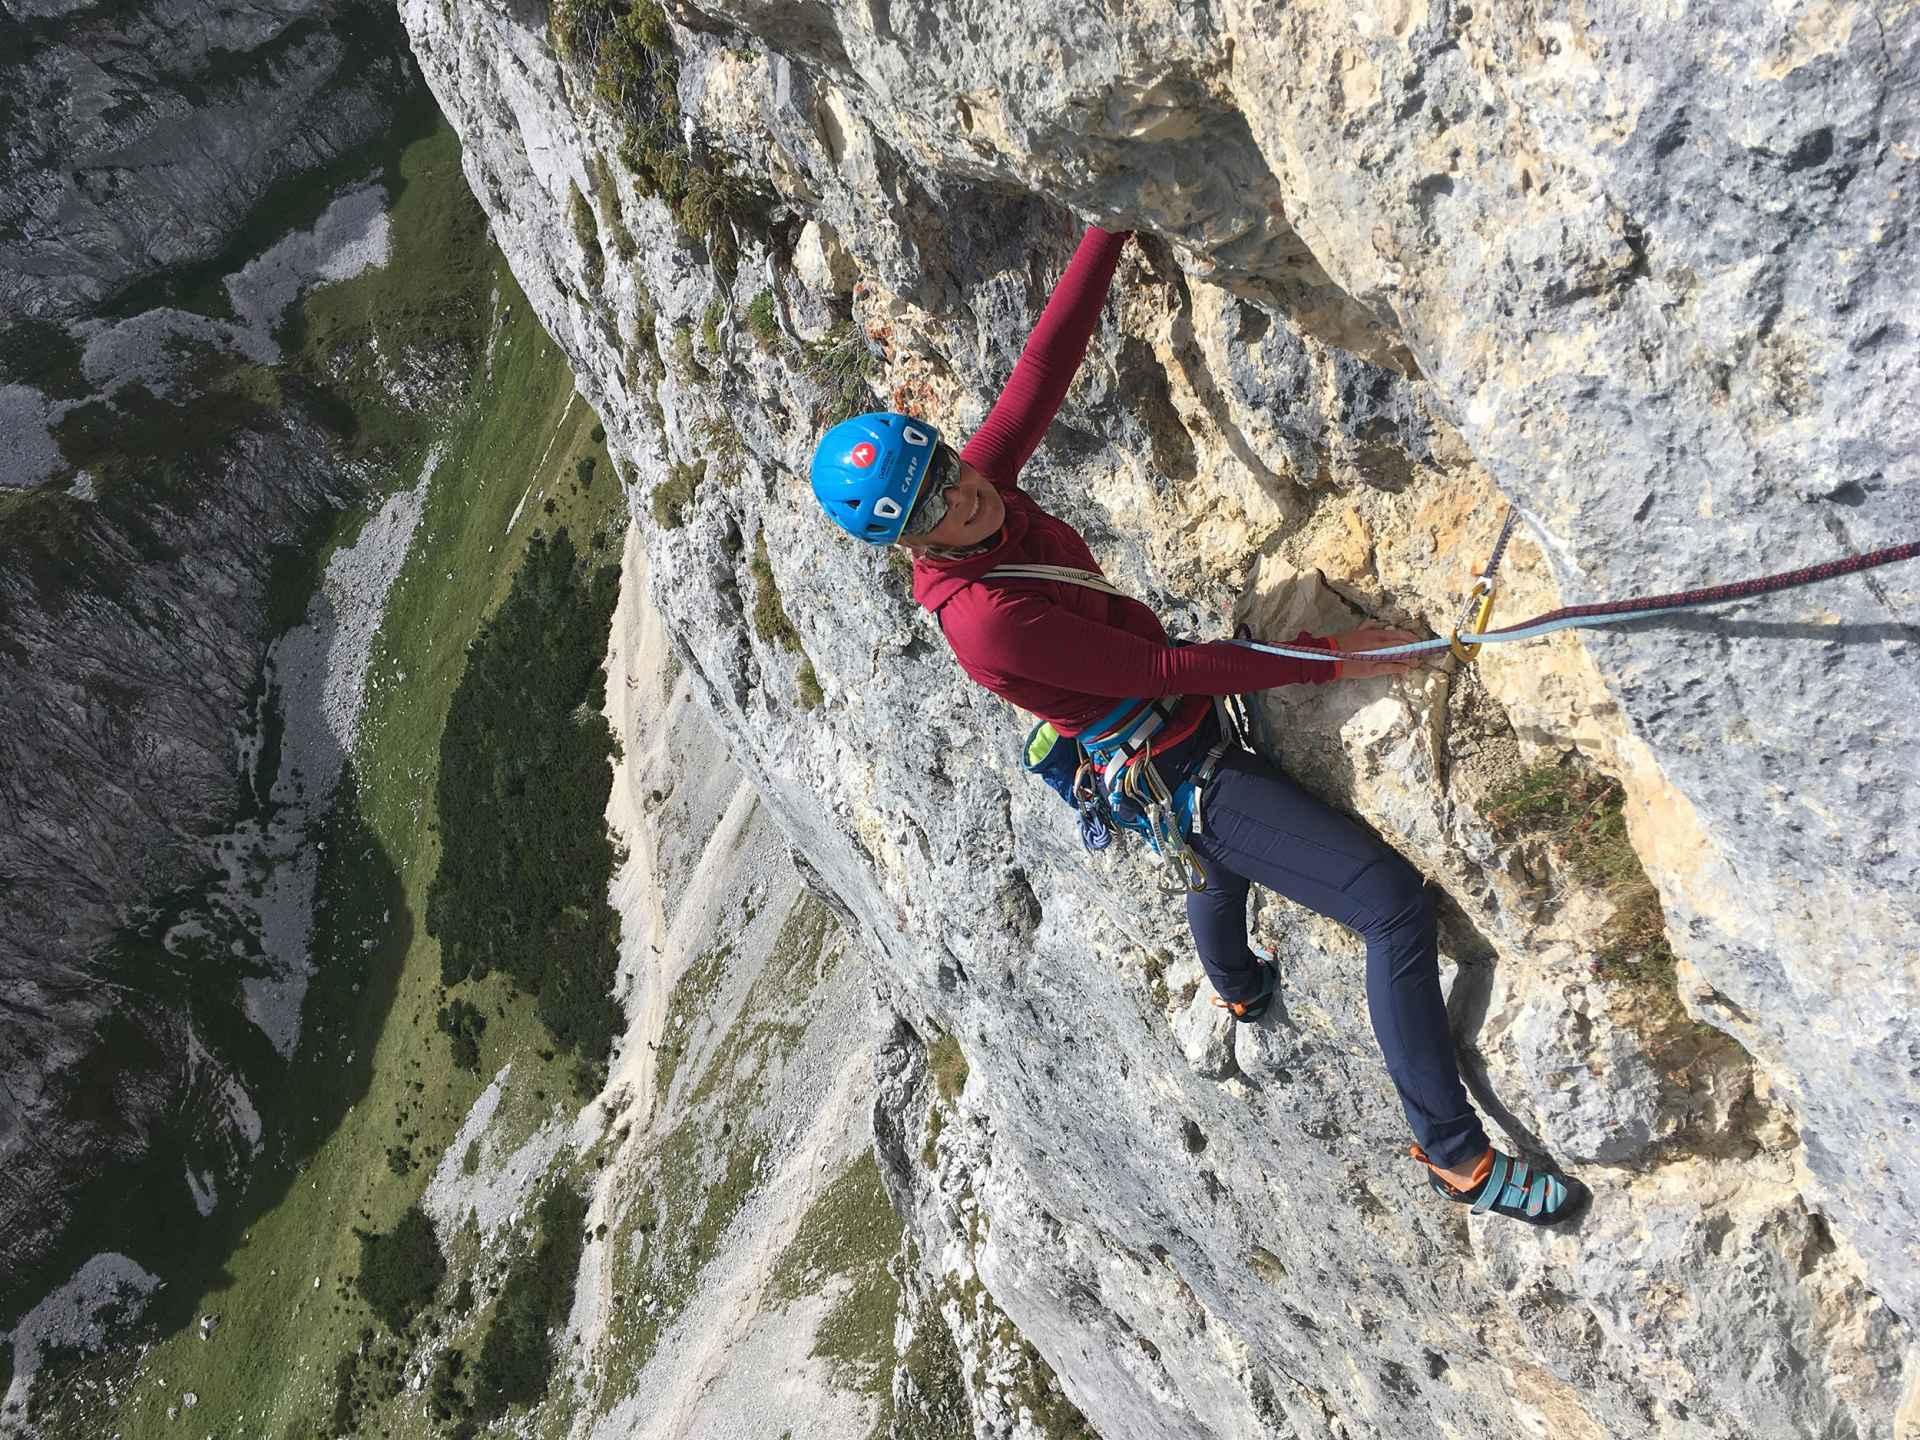 Imagefoto met de SPARROW Ws, Klettertour Alix von Melle September 2019